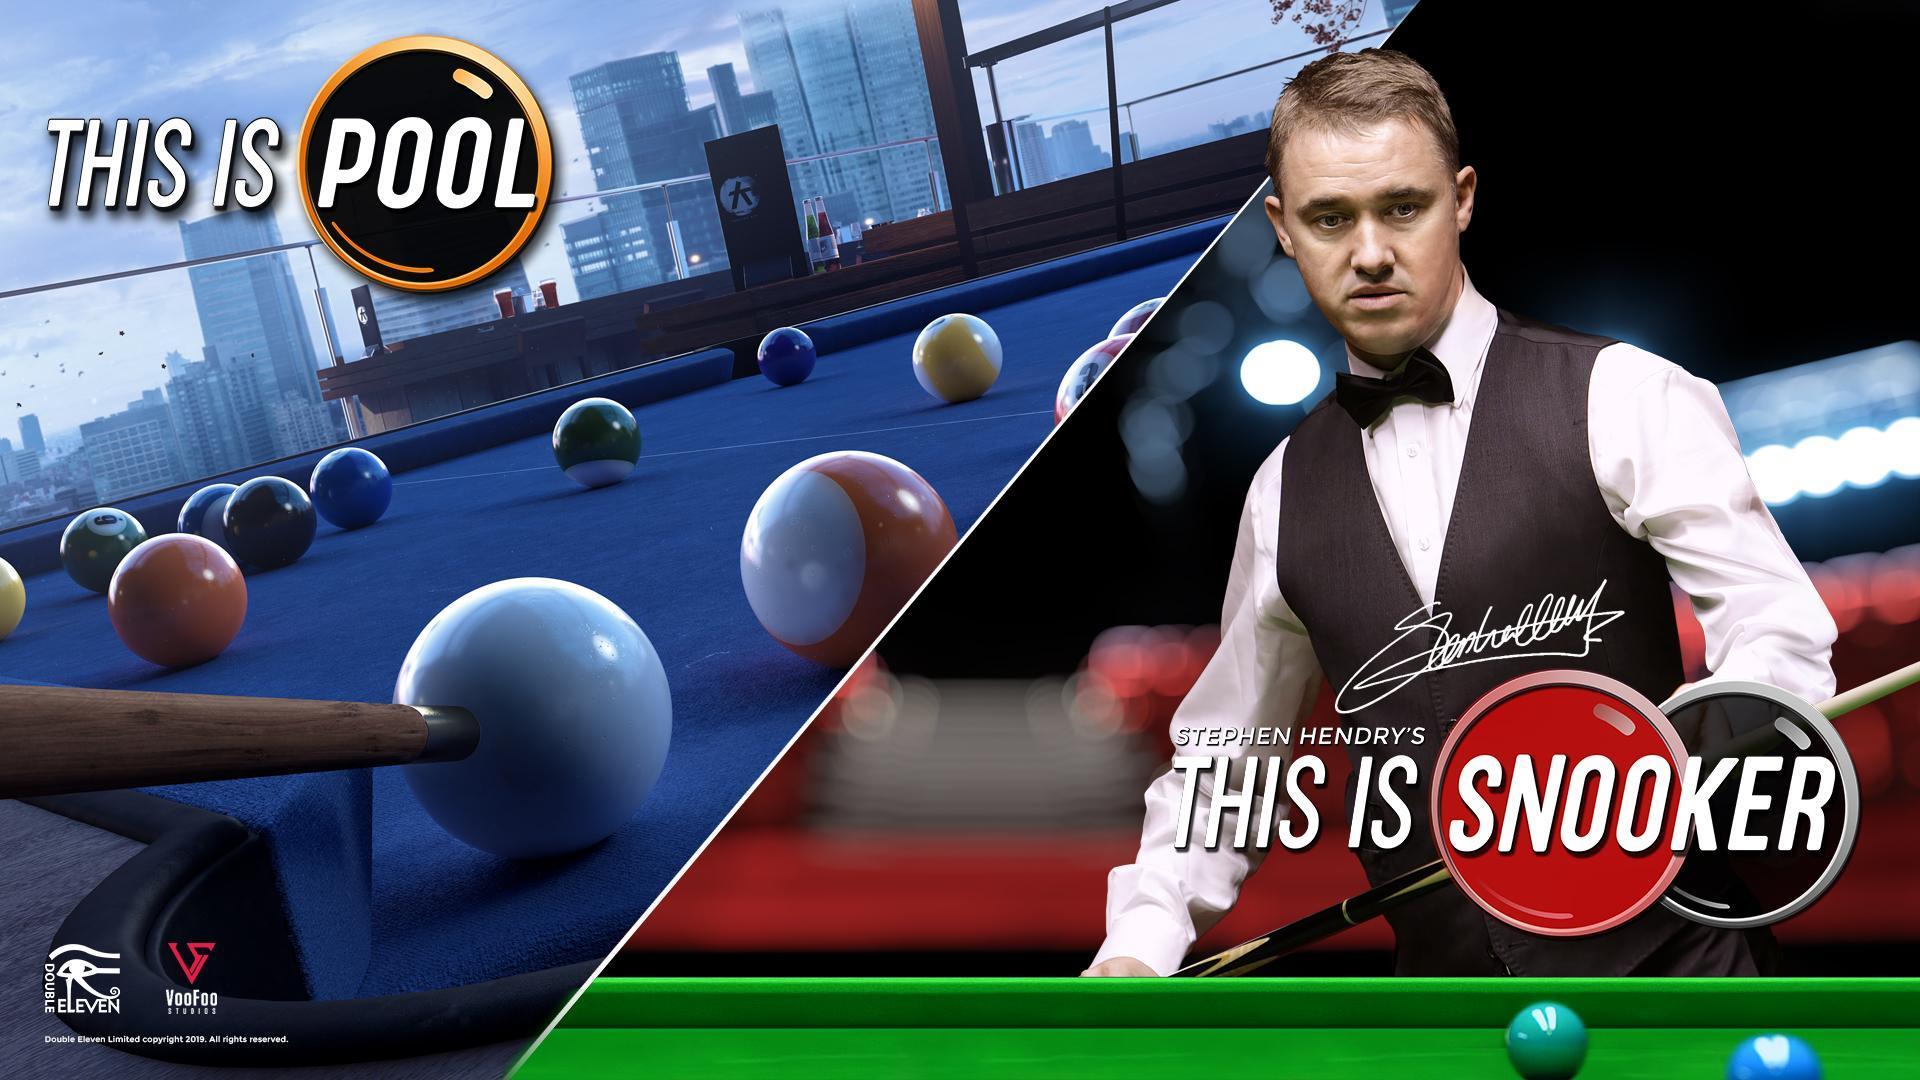 Snooker.Org Live